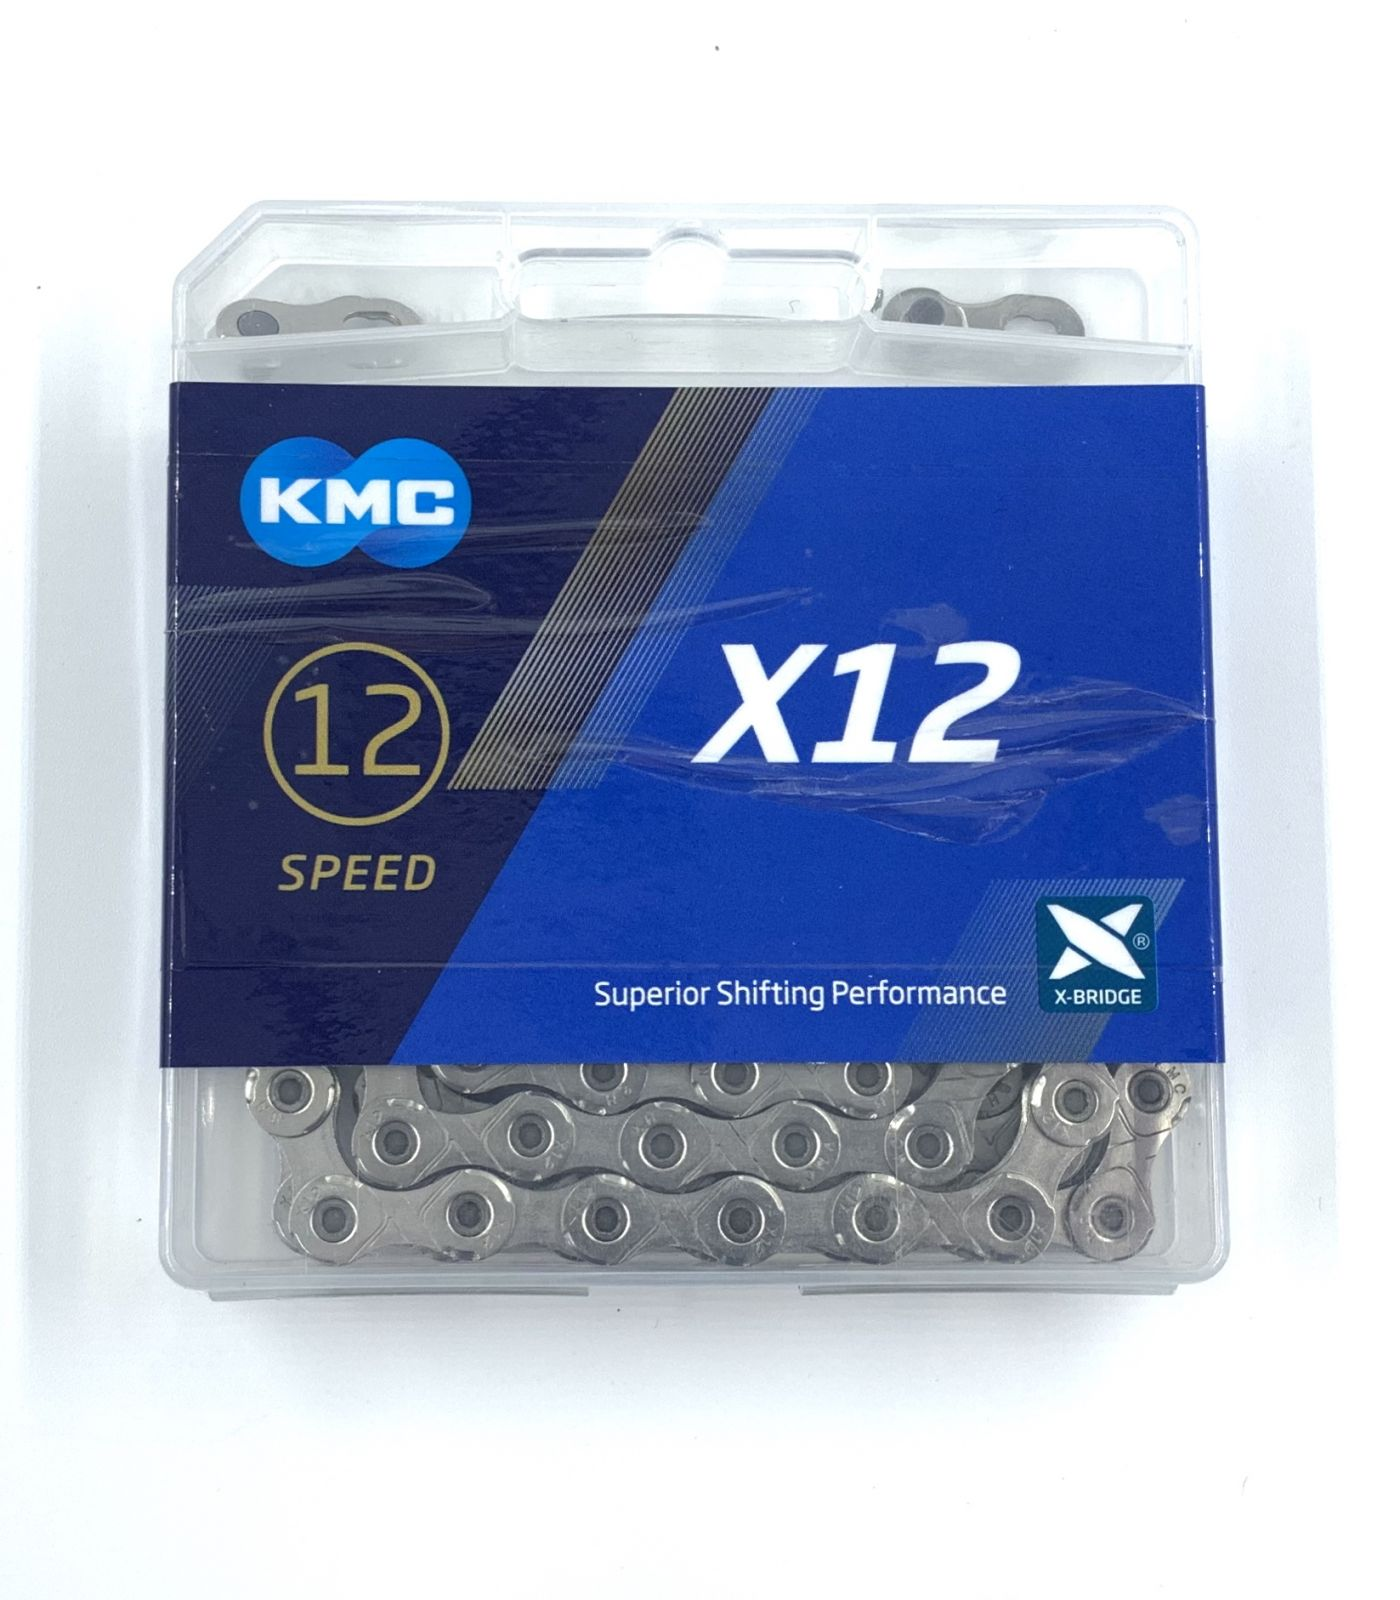 Řetěz KMC x12 12 Speed + spojka